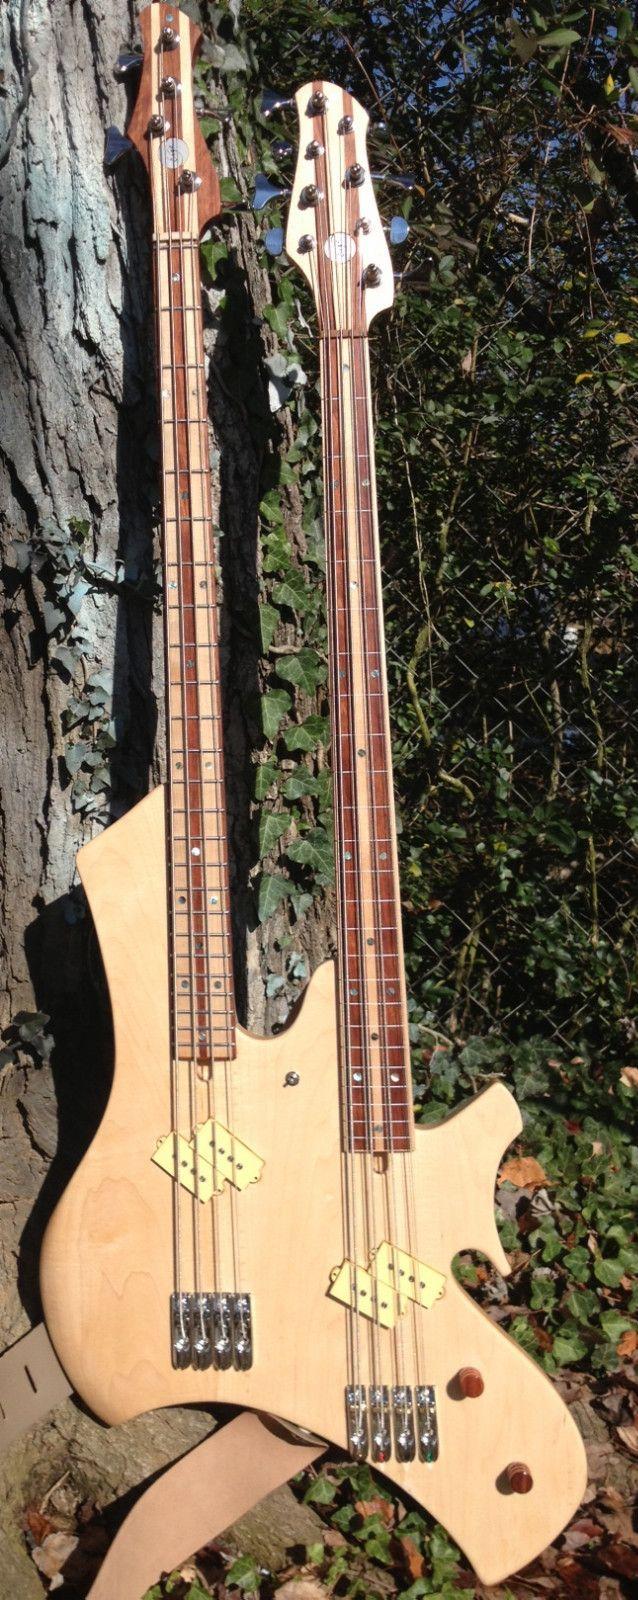 Custom Handmade Doubleneck 4 8 String Electric Bass Guitar Fretted Fretless | eBay